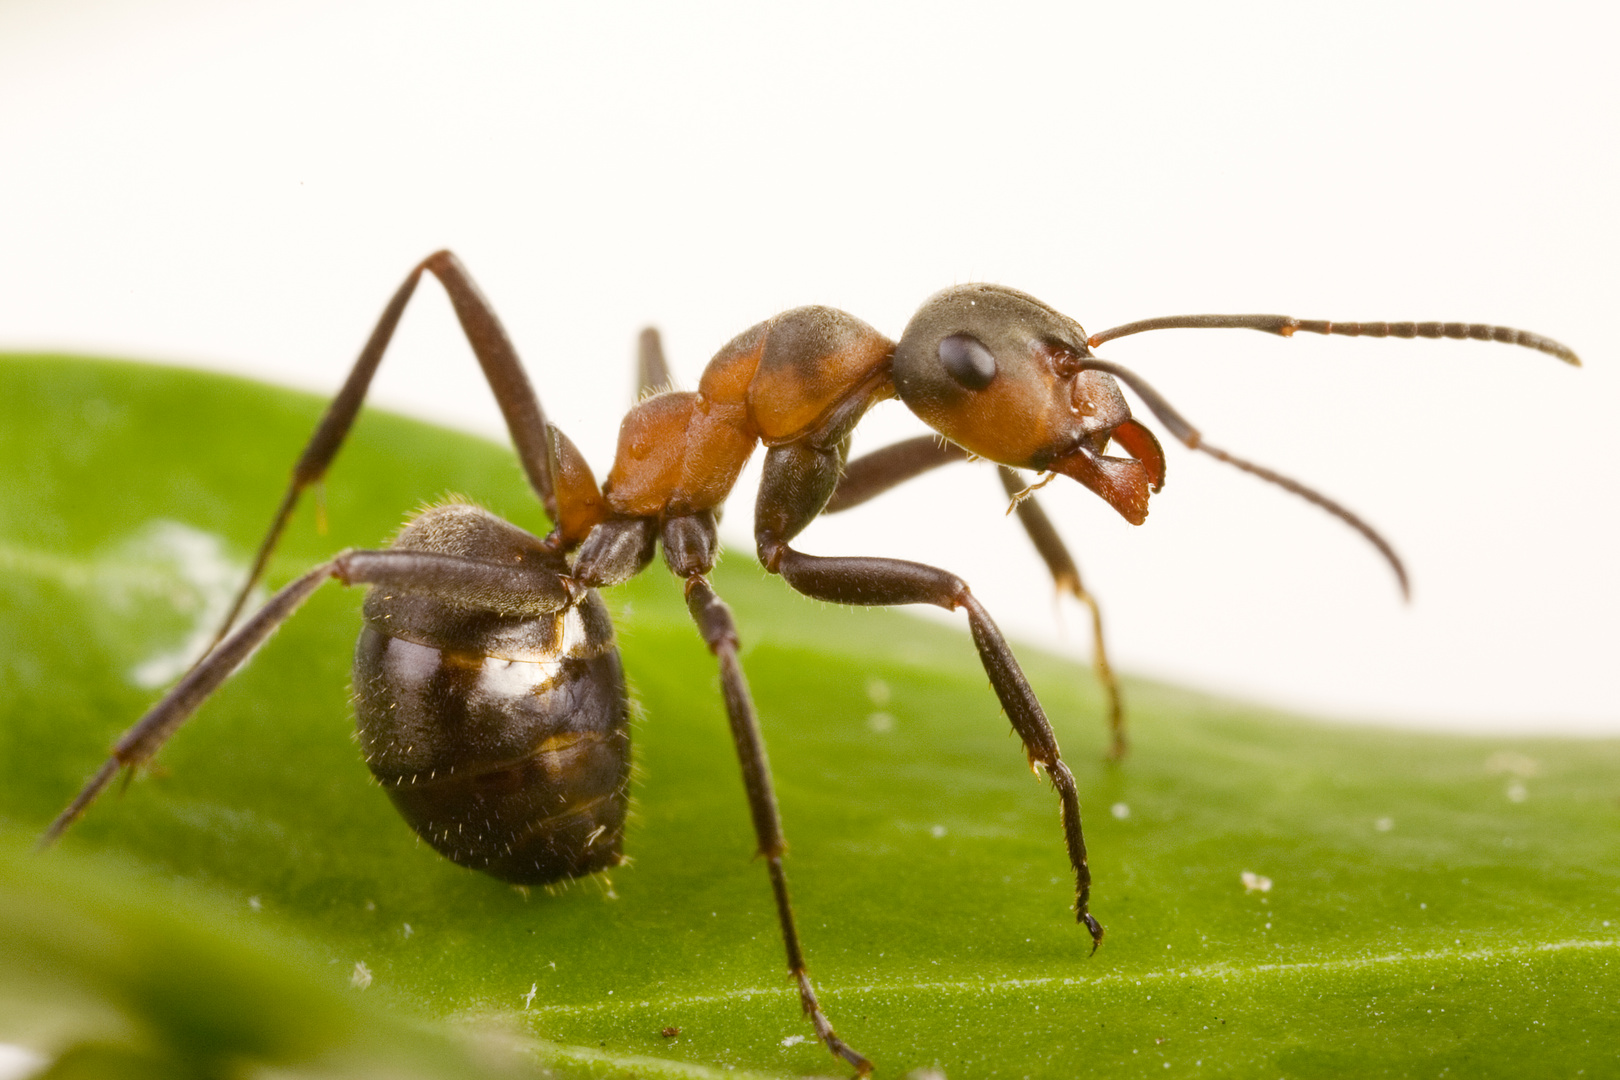 Waldameise (Formica rufa) - wood ant (Formica rufa)